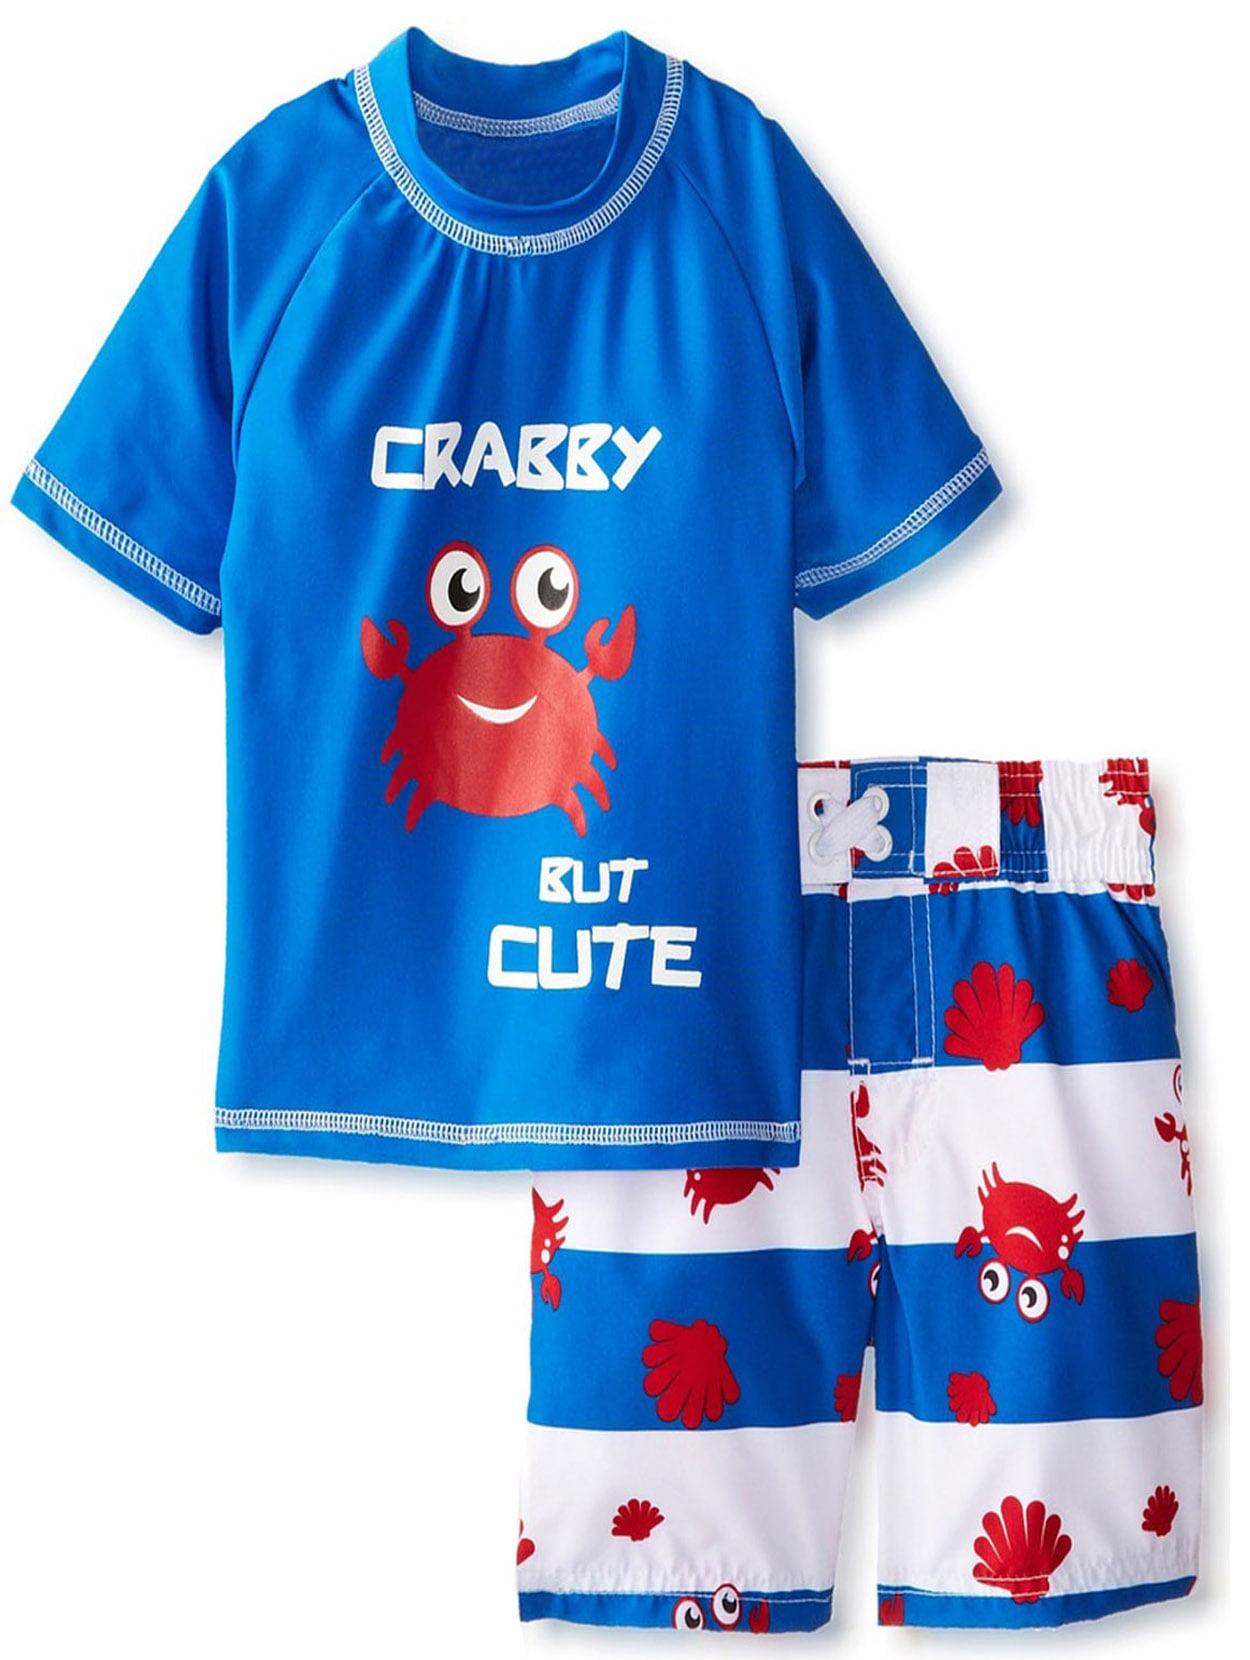 iXtreme Toddler Boy Swimwear Cute Crab Short Sleeve Shirt Rashguard Swim Board Short Trunk Set by iXtreme